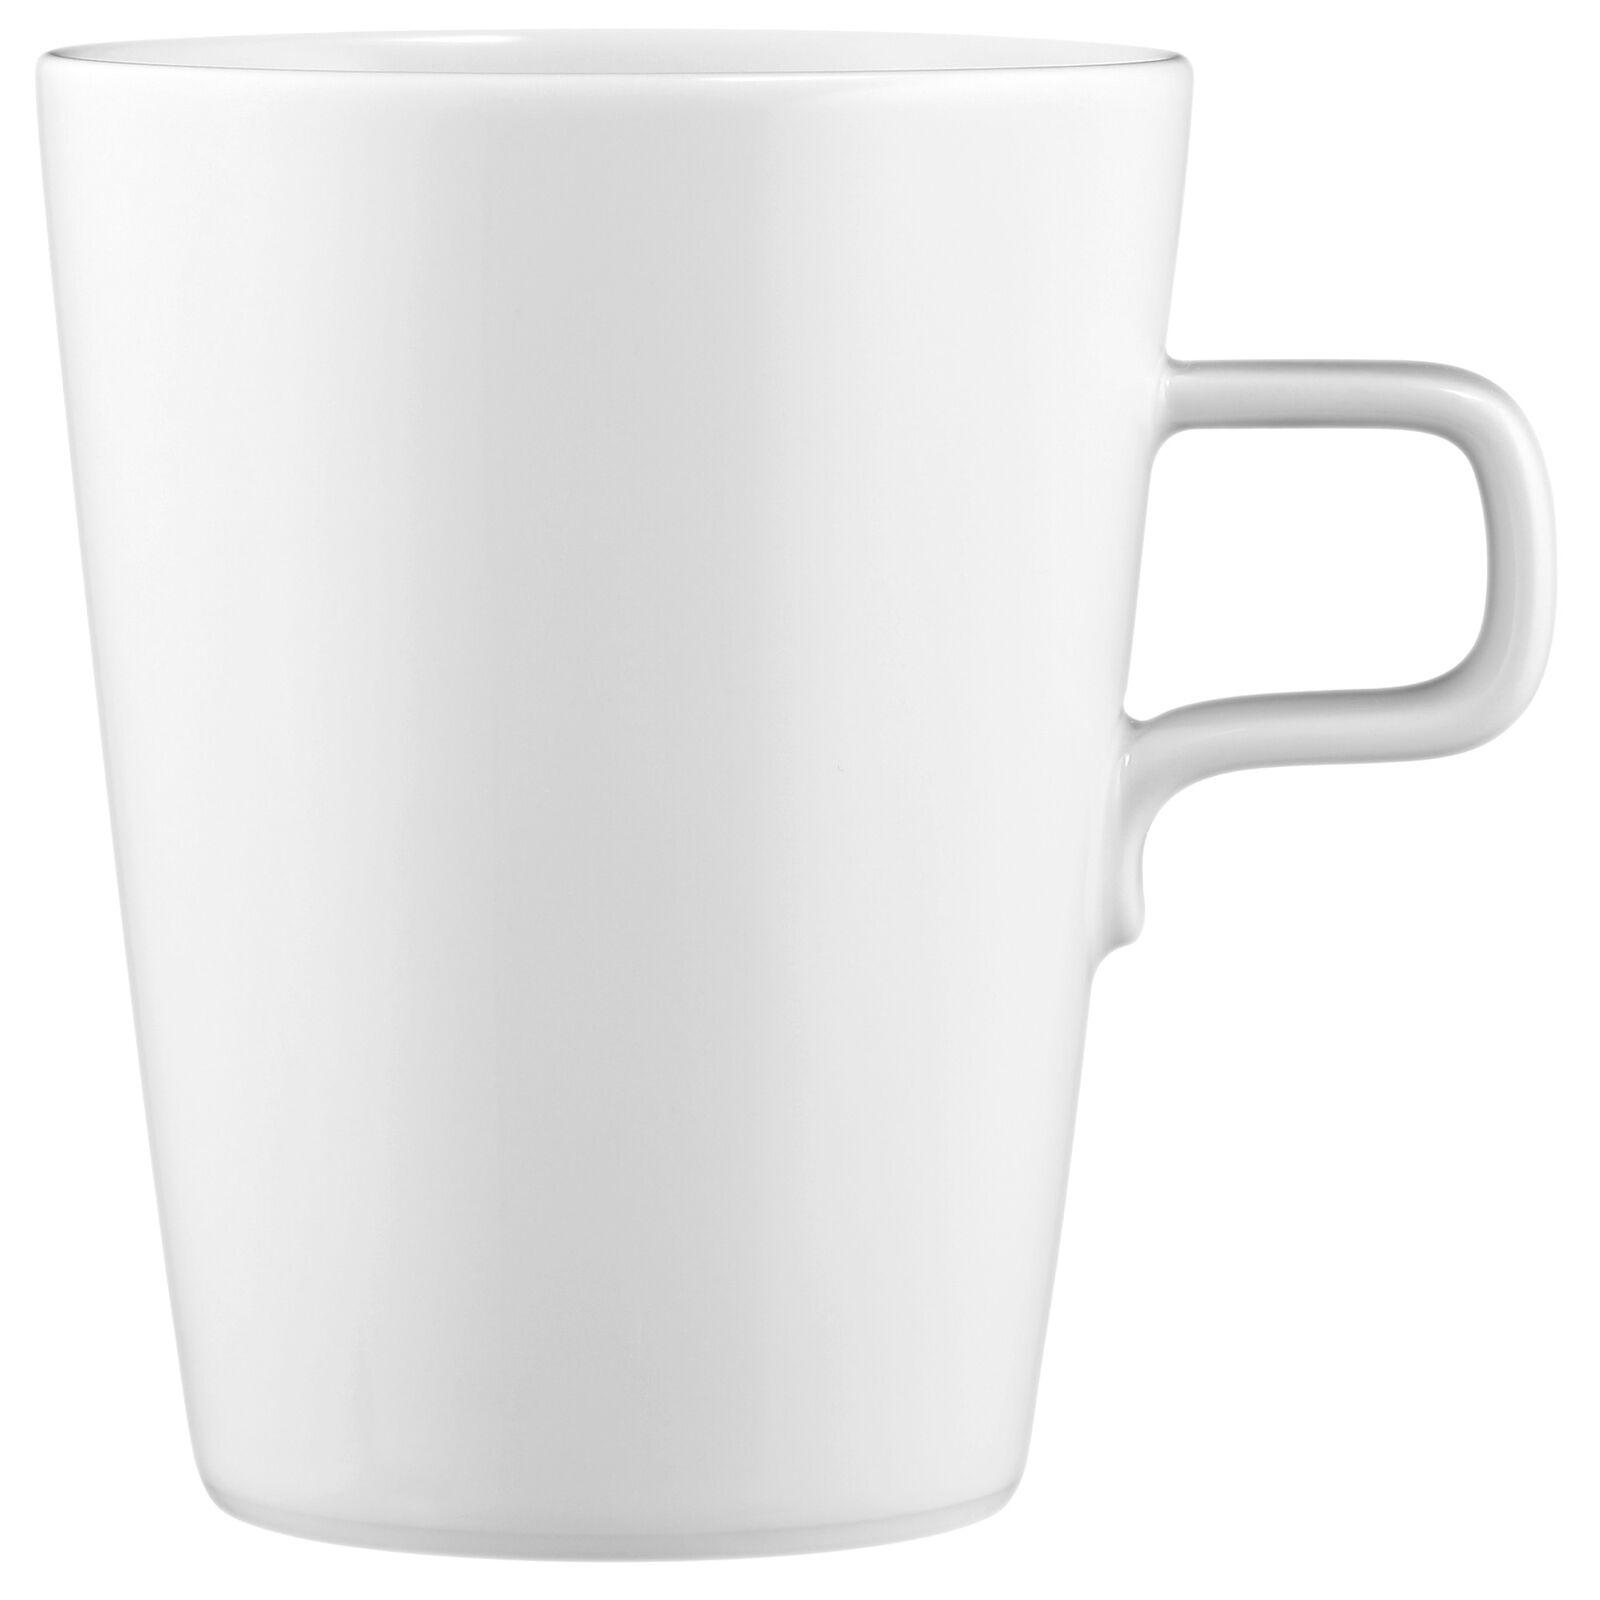 Seltmann Weiden No Limits Blanc 003 Tasse Avec Henkel 0,45 L 6 pièces